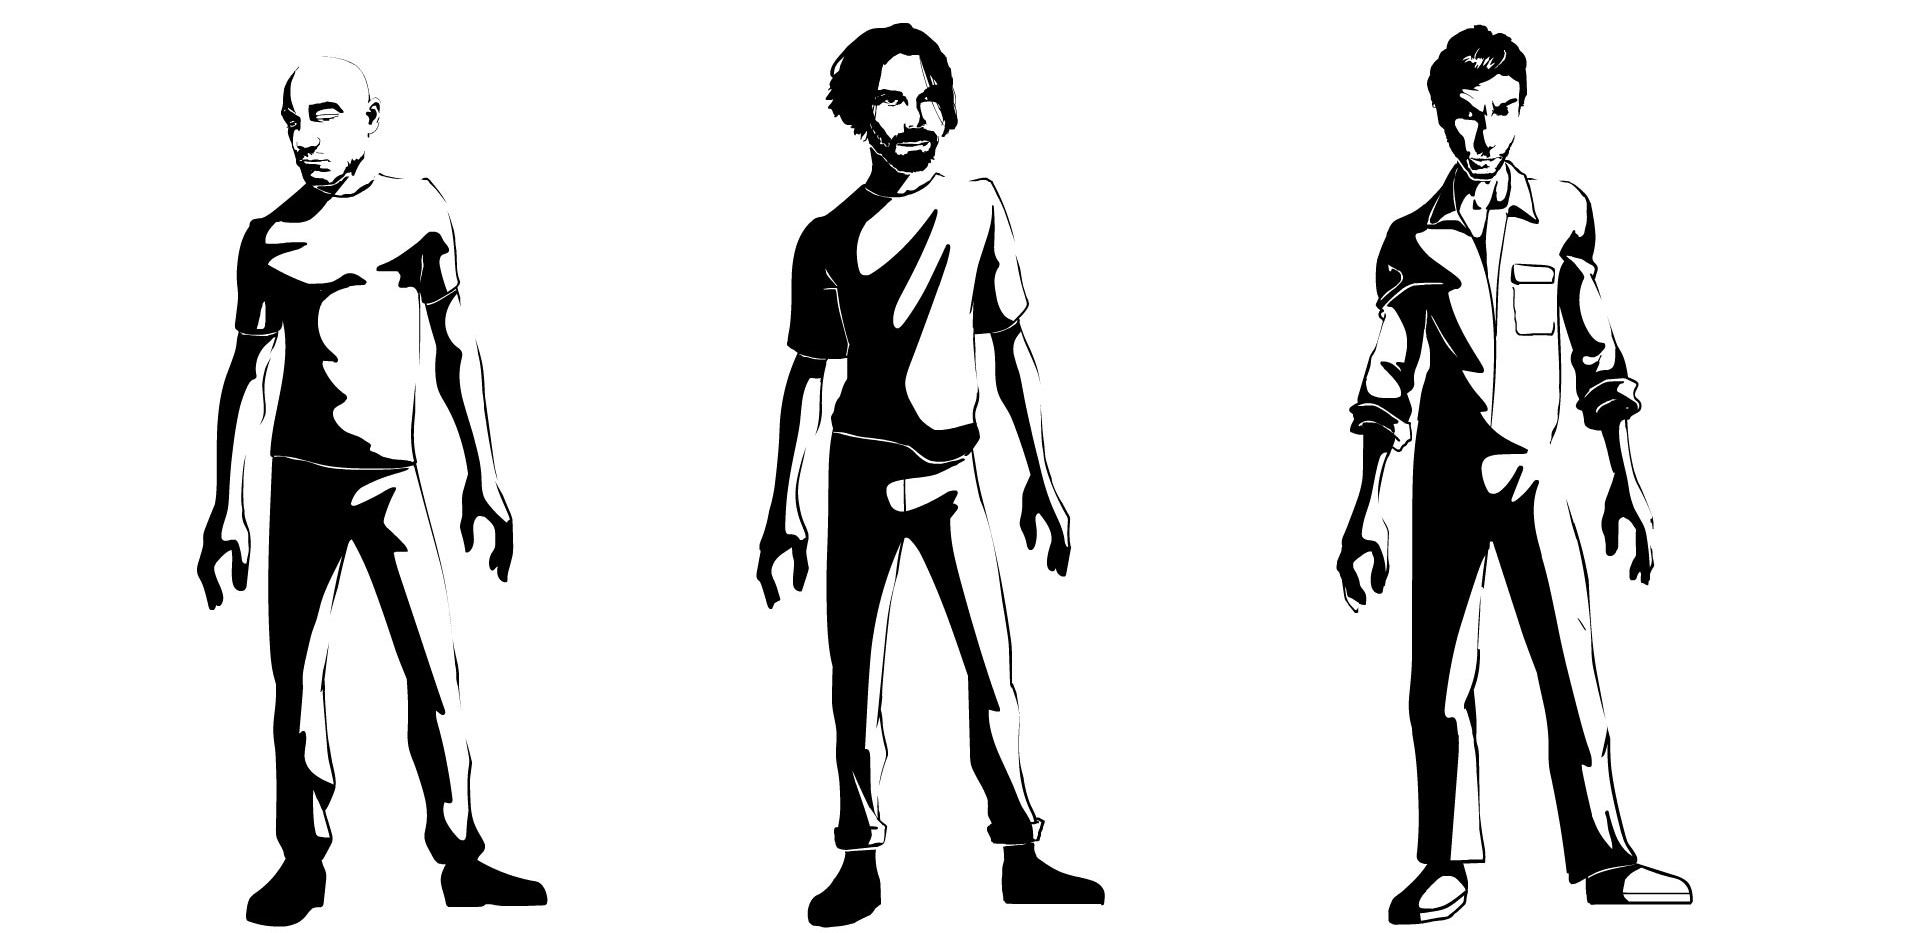 Biffy_Characters_Bodies_V005.jpg